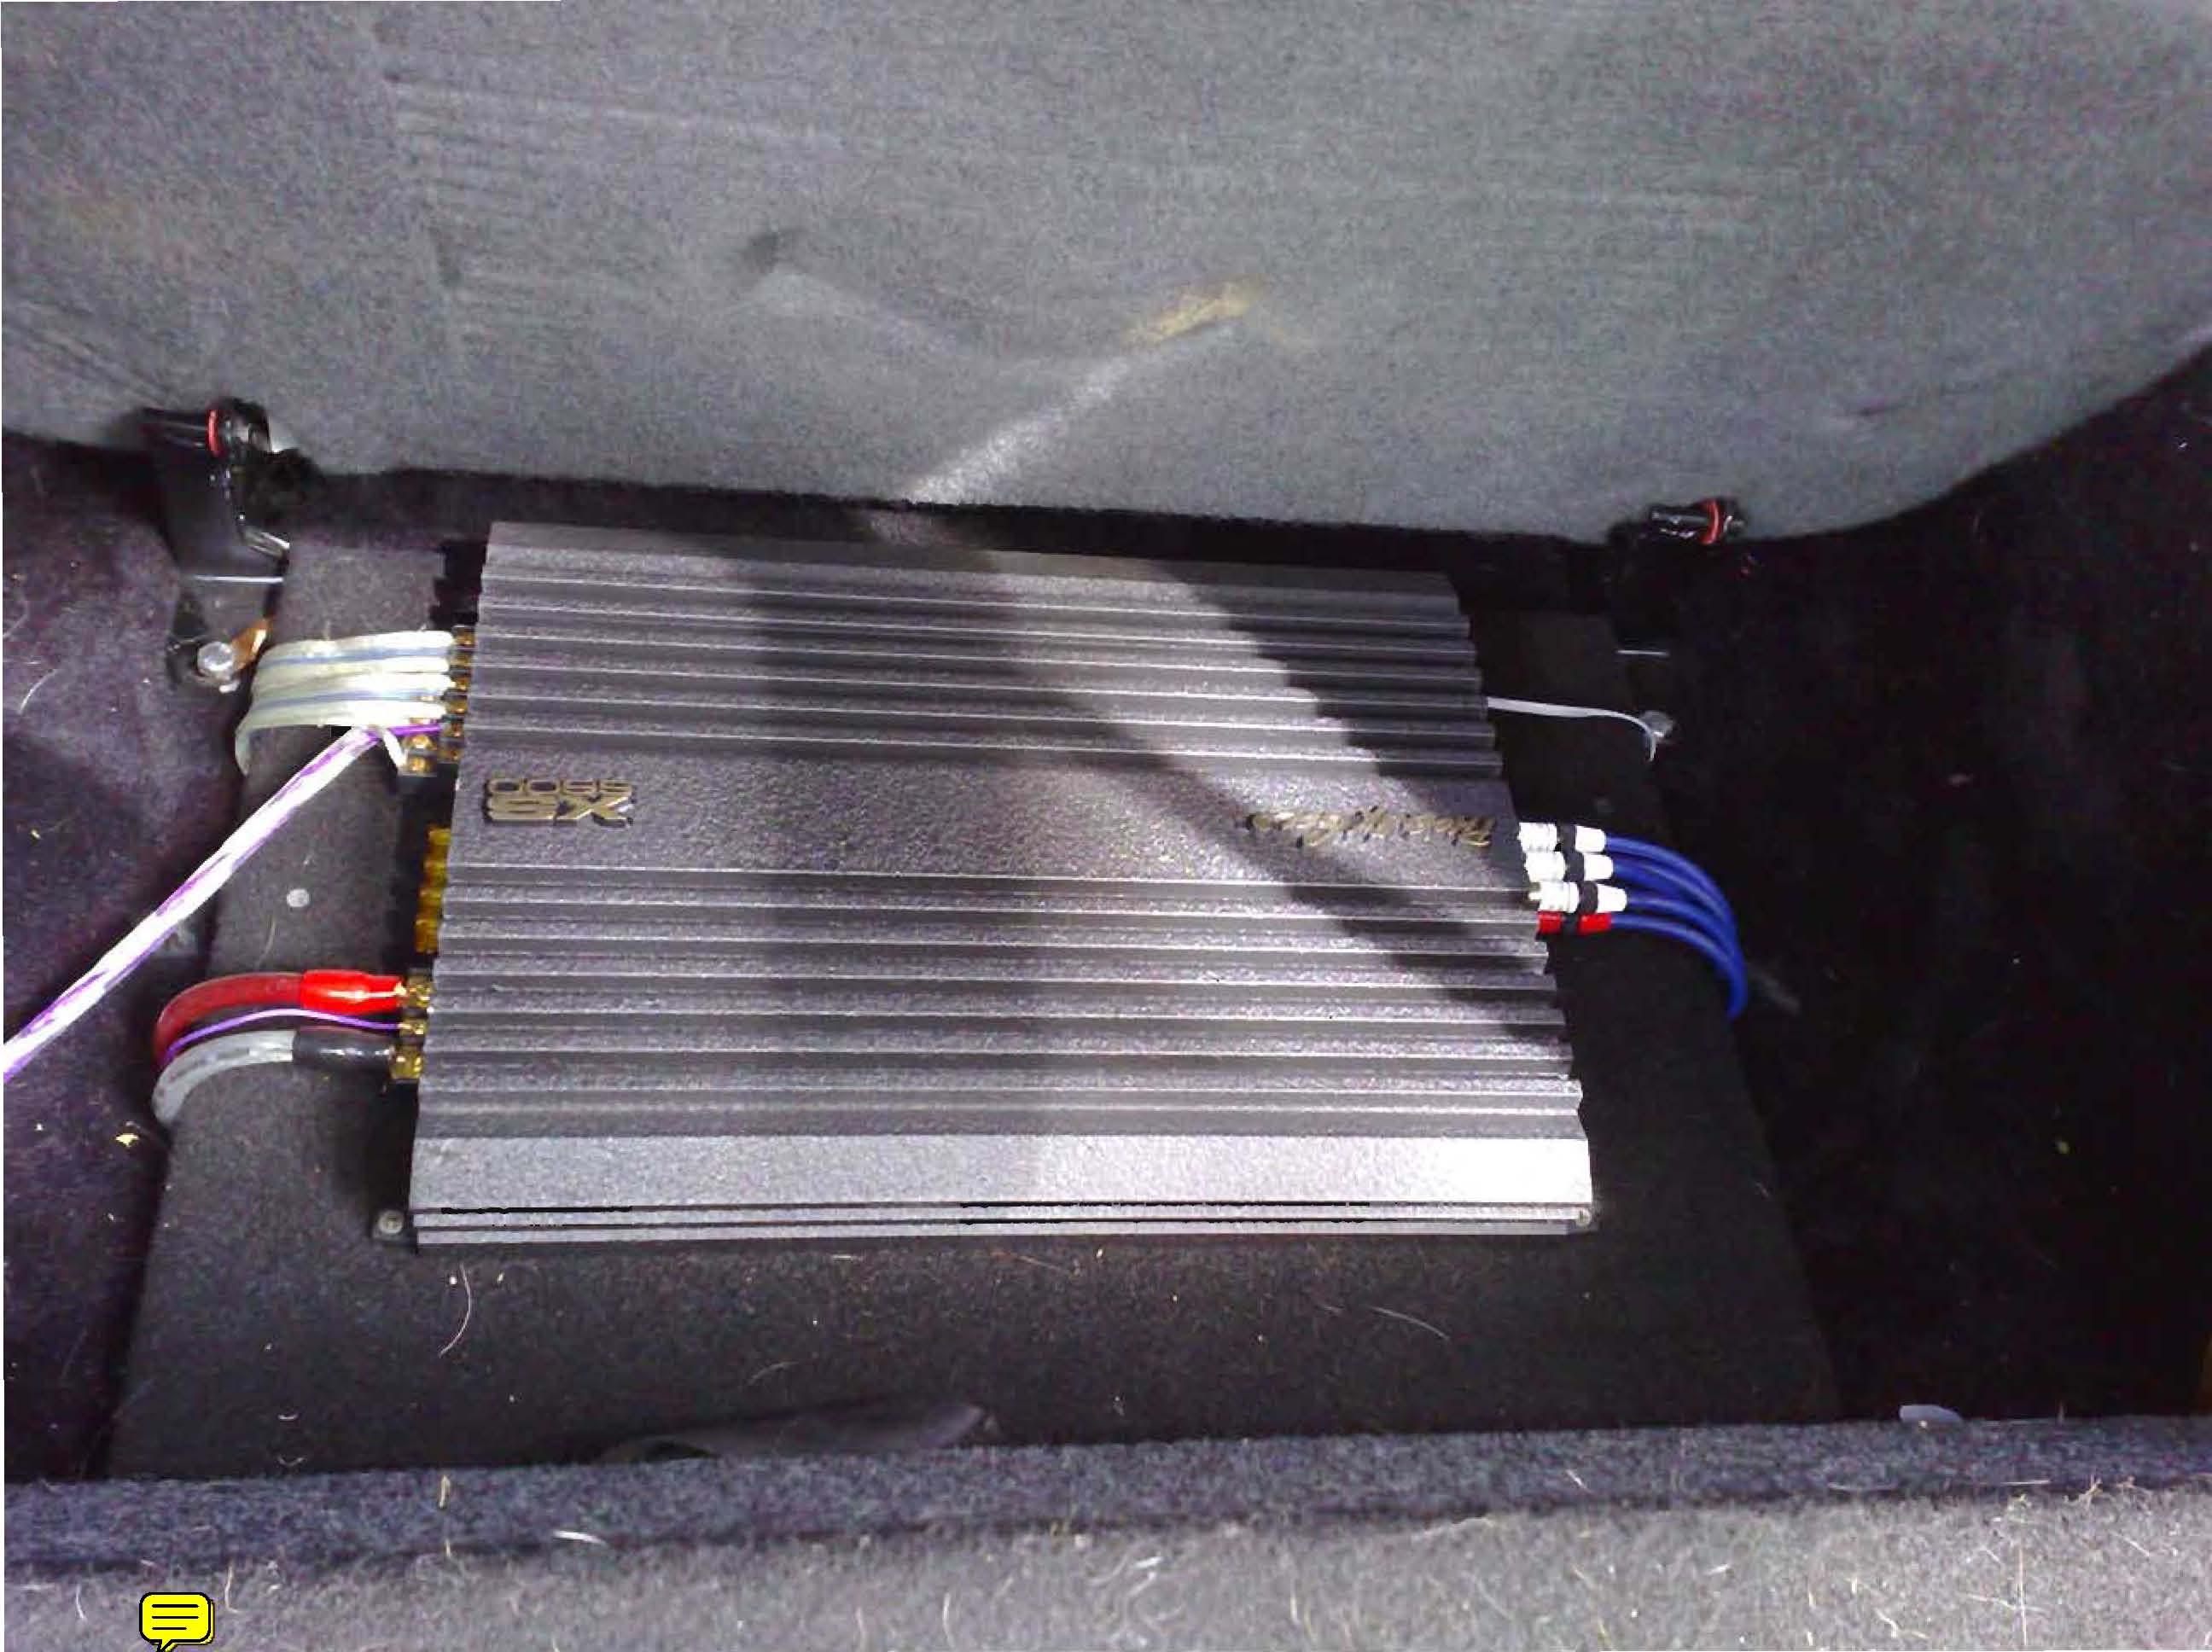 cj7-jeep-w-z06-ls6-corvette-engine-475-hp-54-pages_page_38.jpg